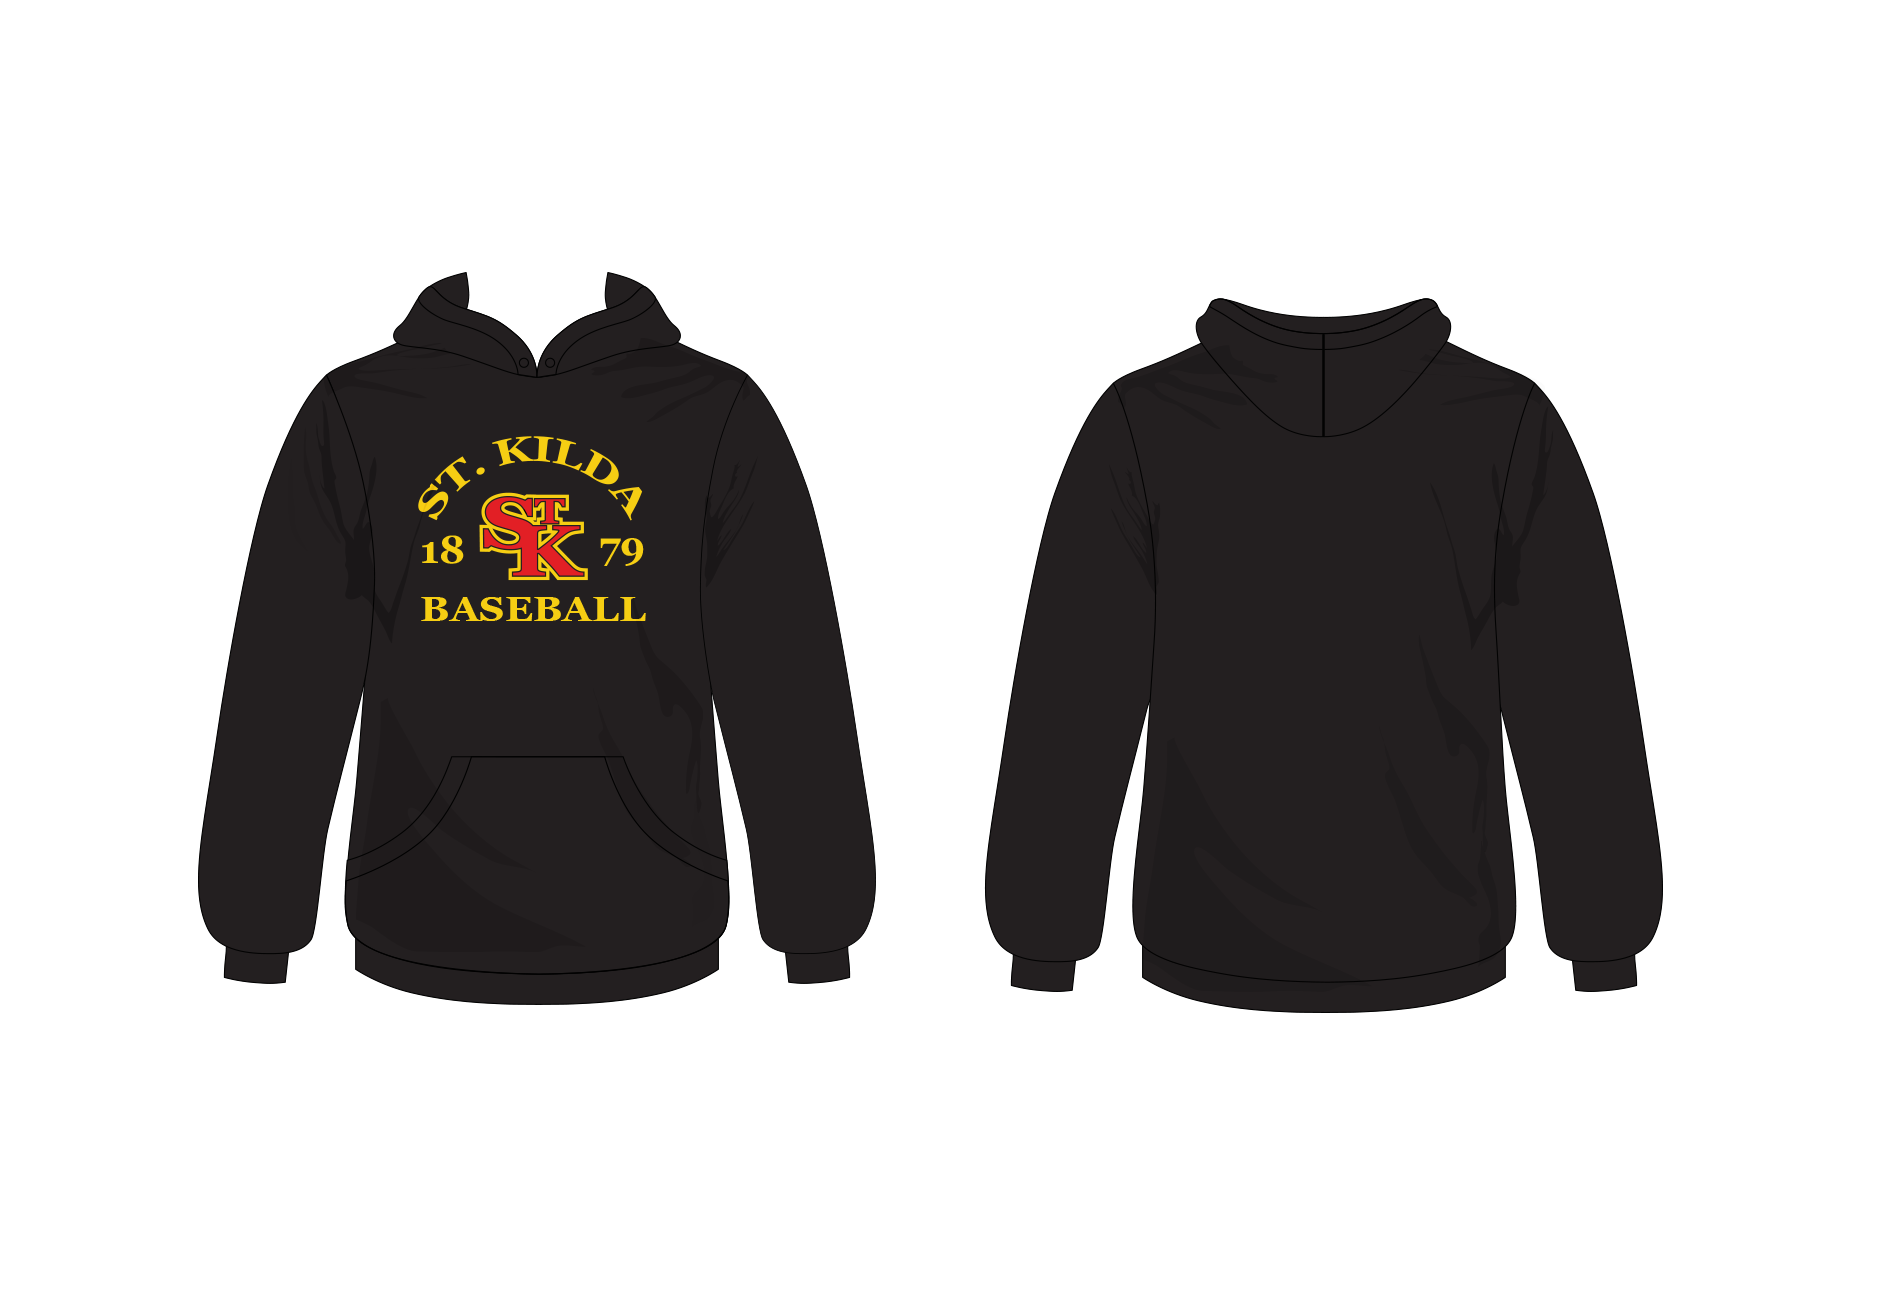 St. Kilda Baseball Club Hoodie